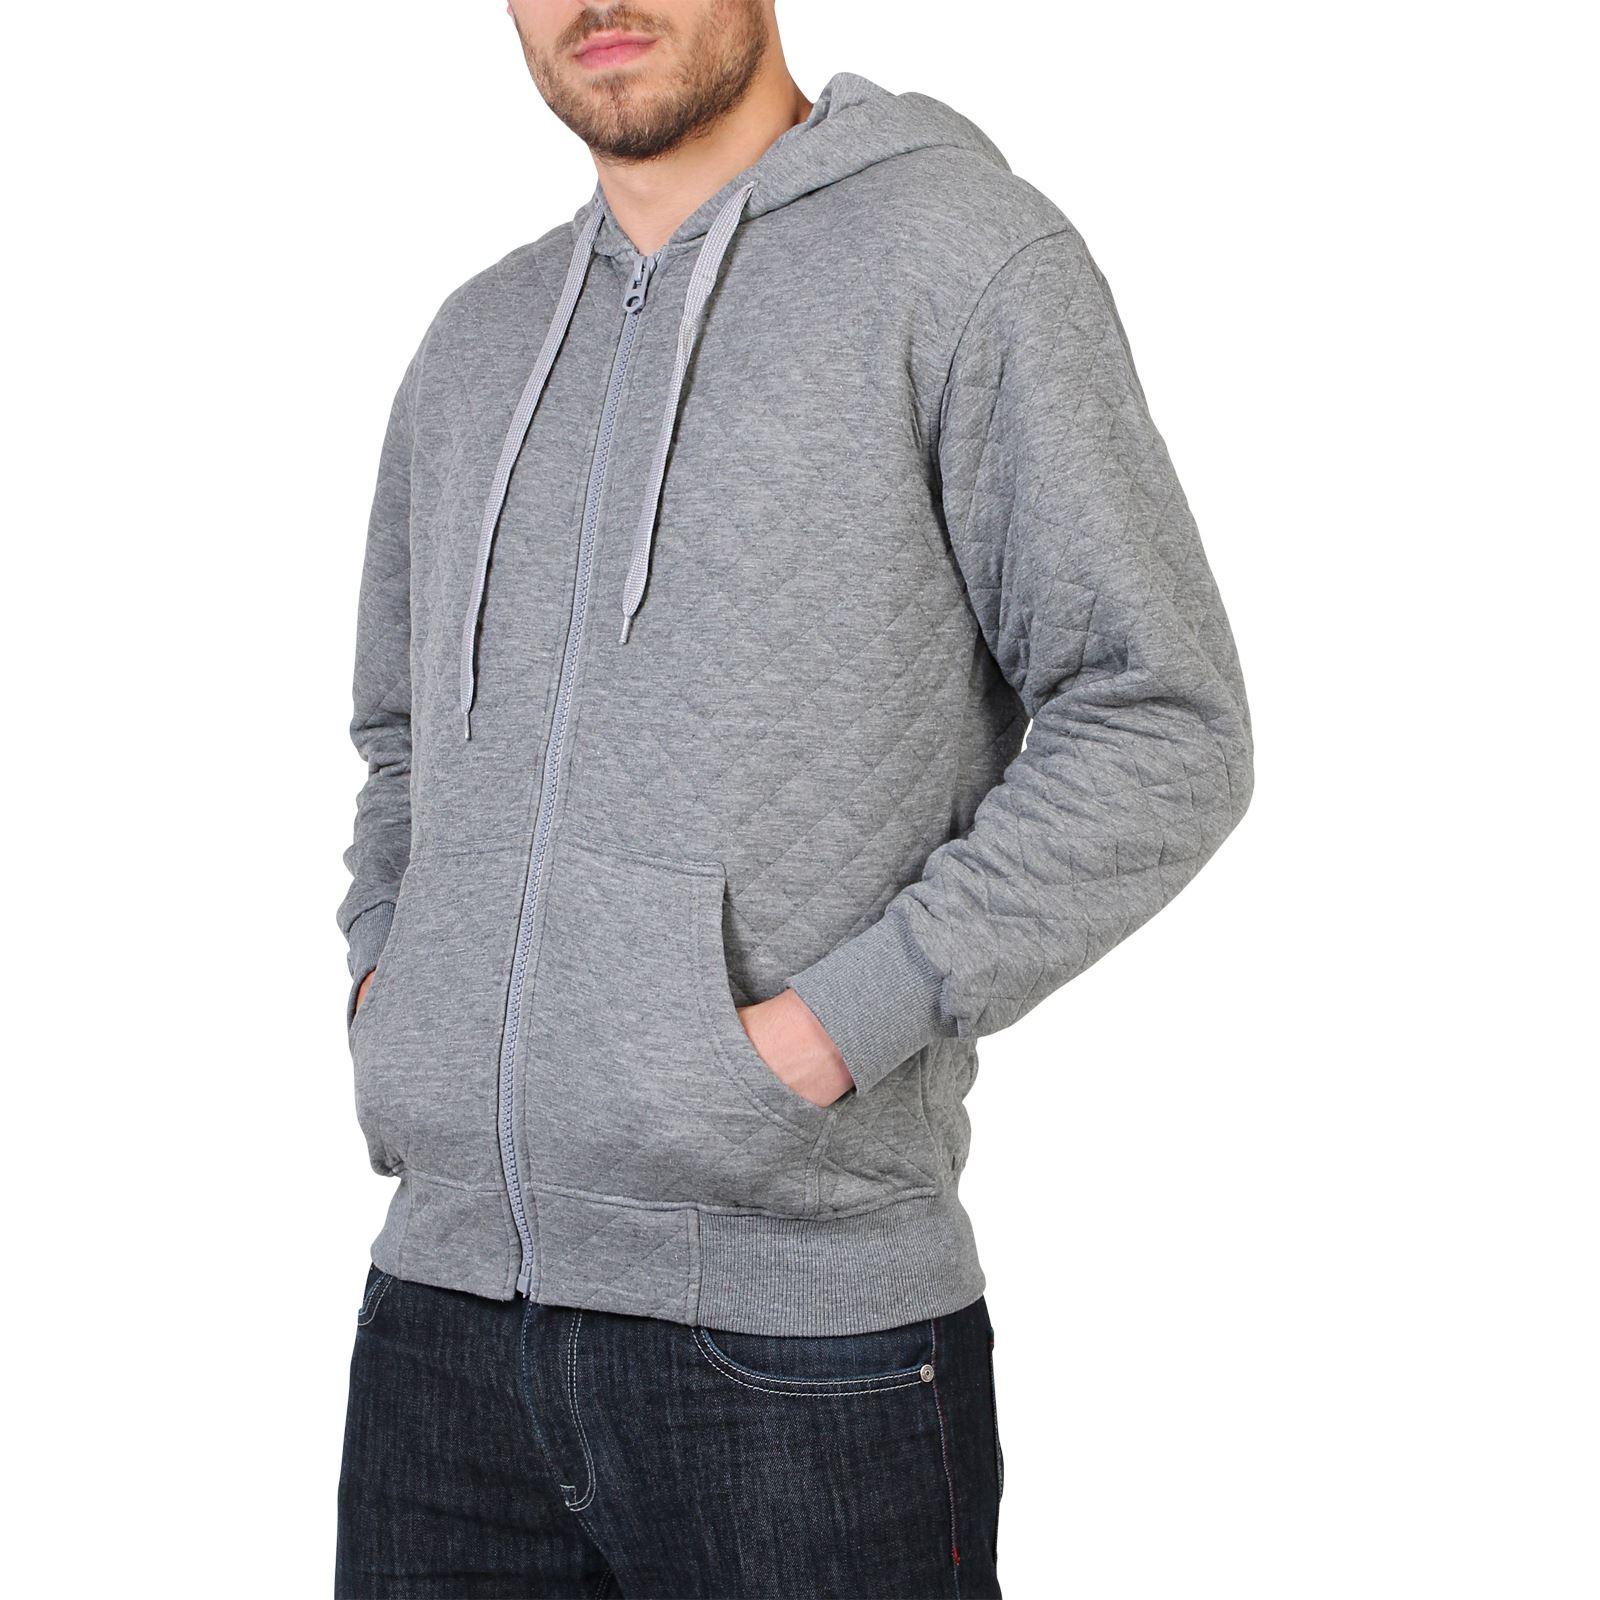 Mens cotton hoodie